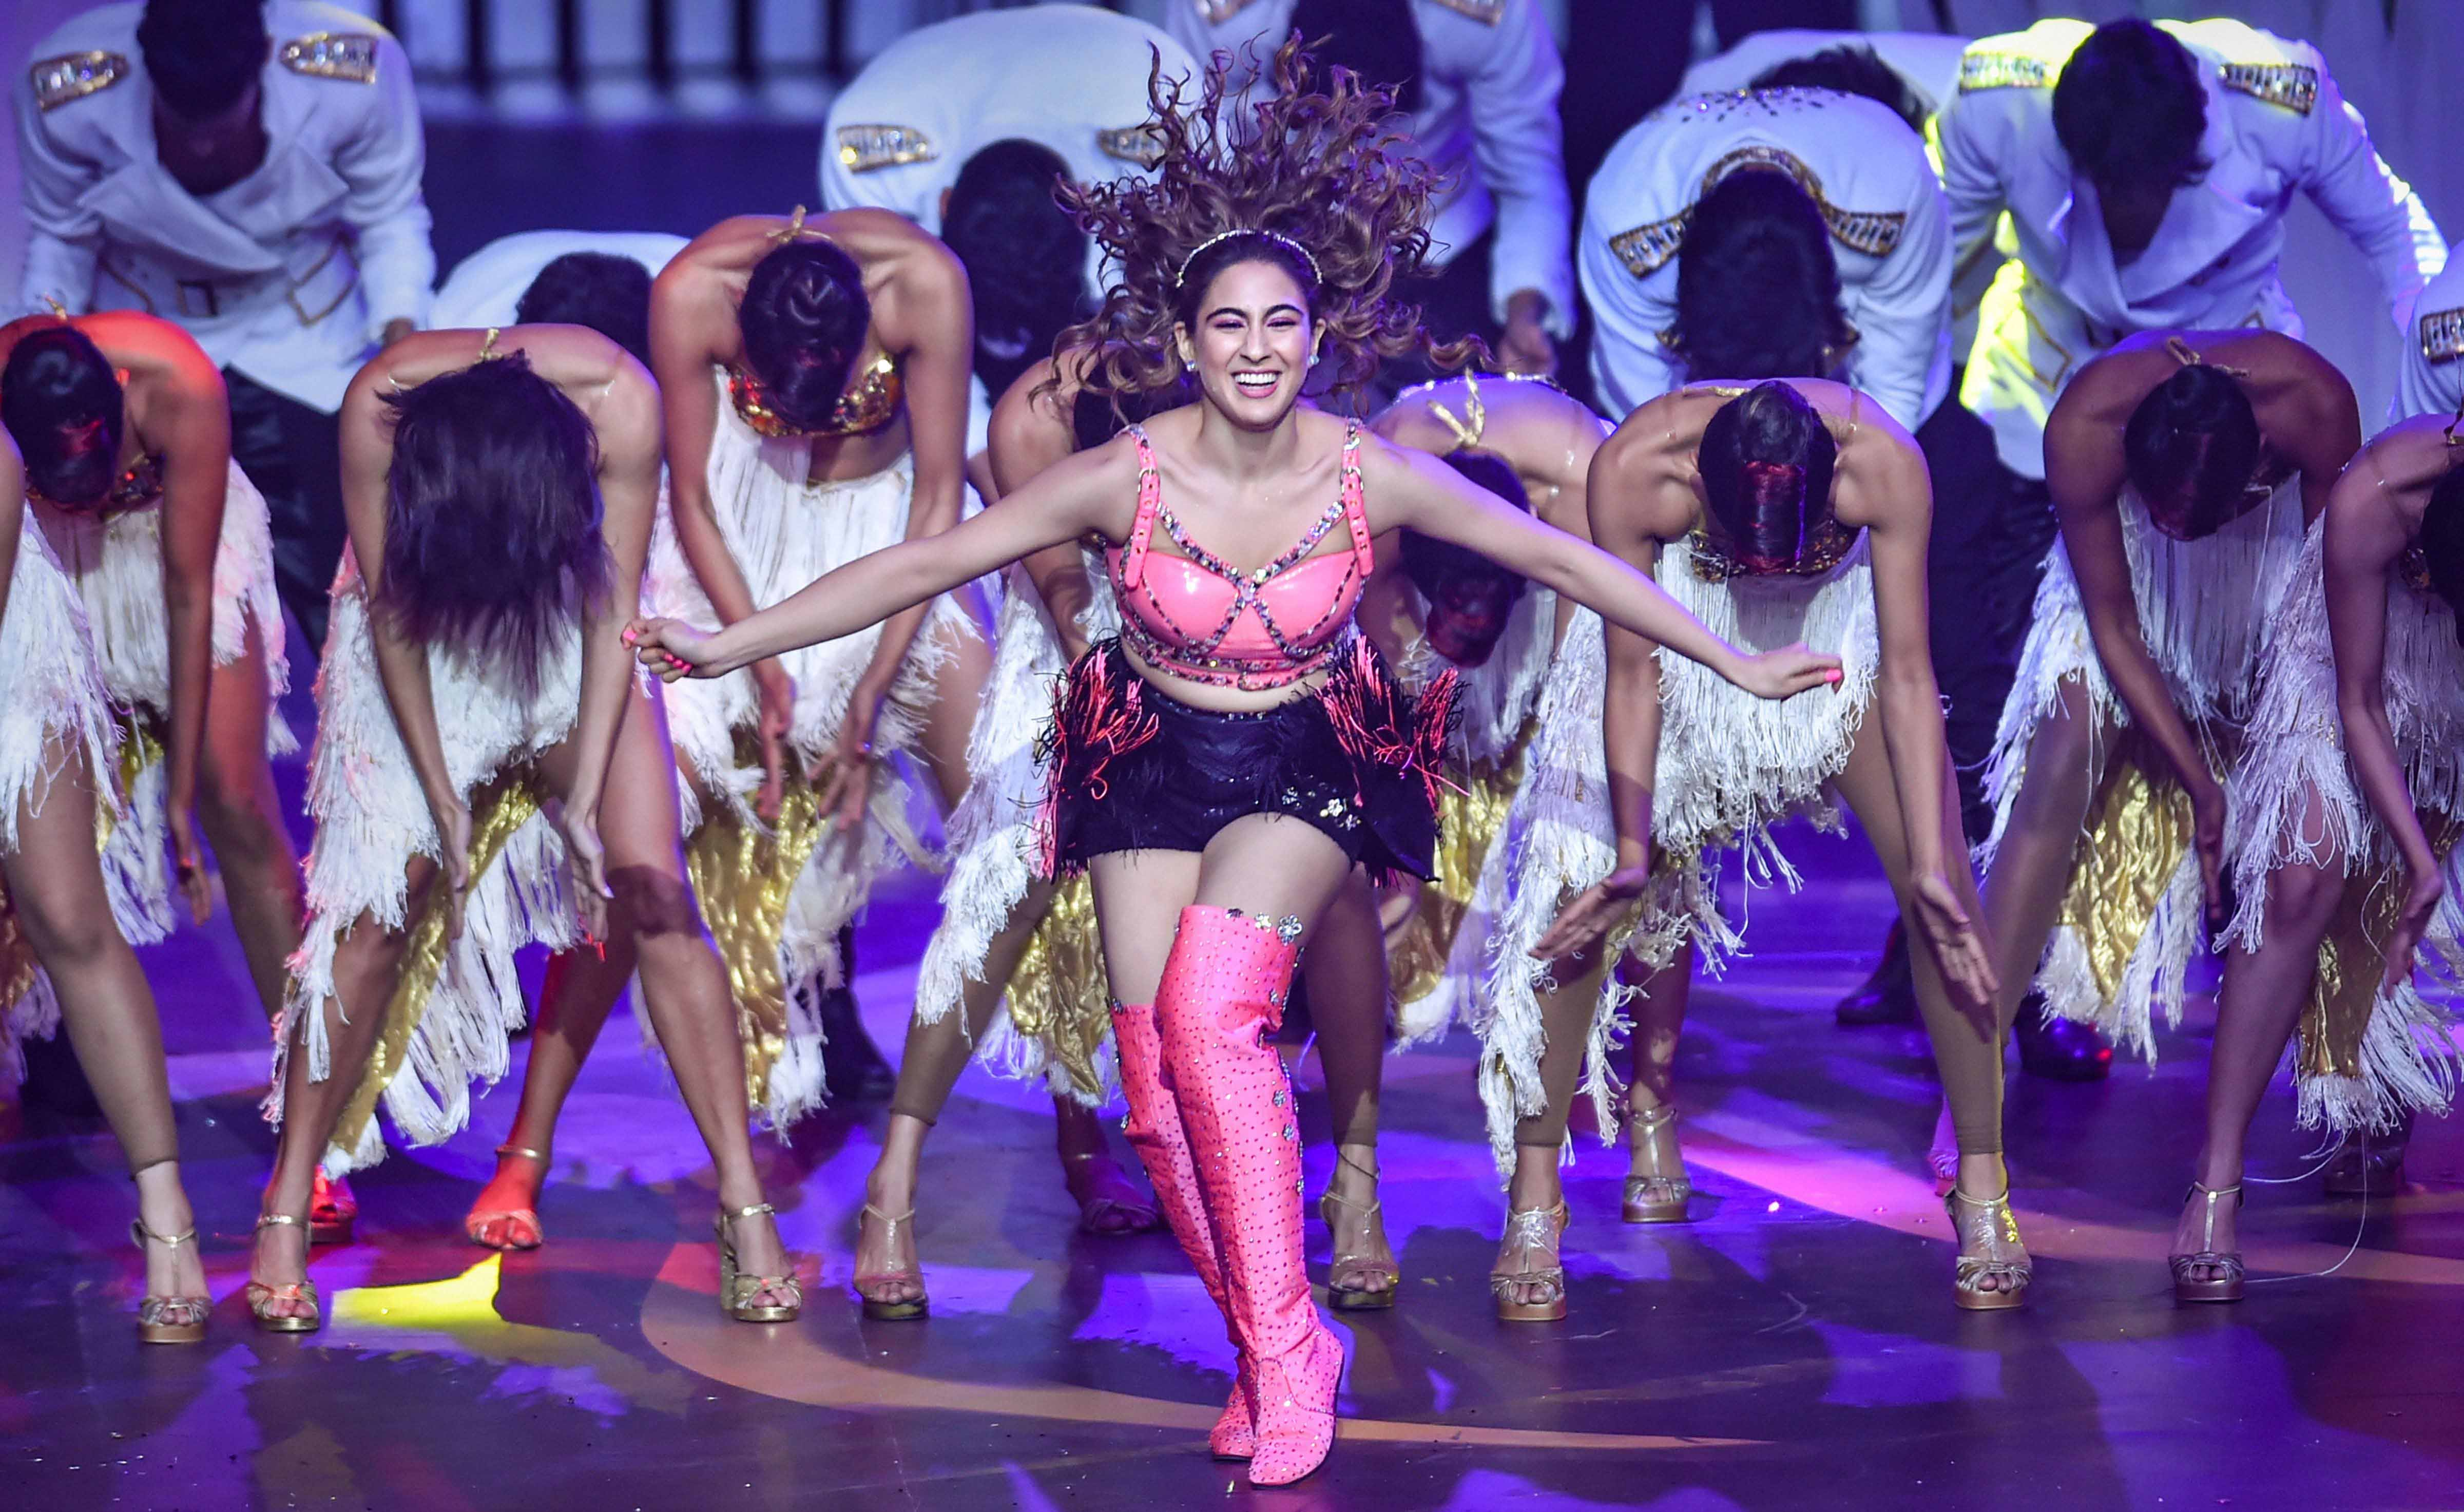 In Deepika Padukone Vs IIFA Memes, The Actress Had The Last Laugh